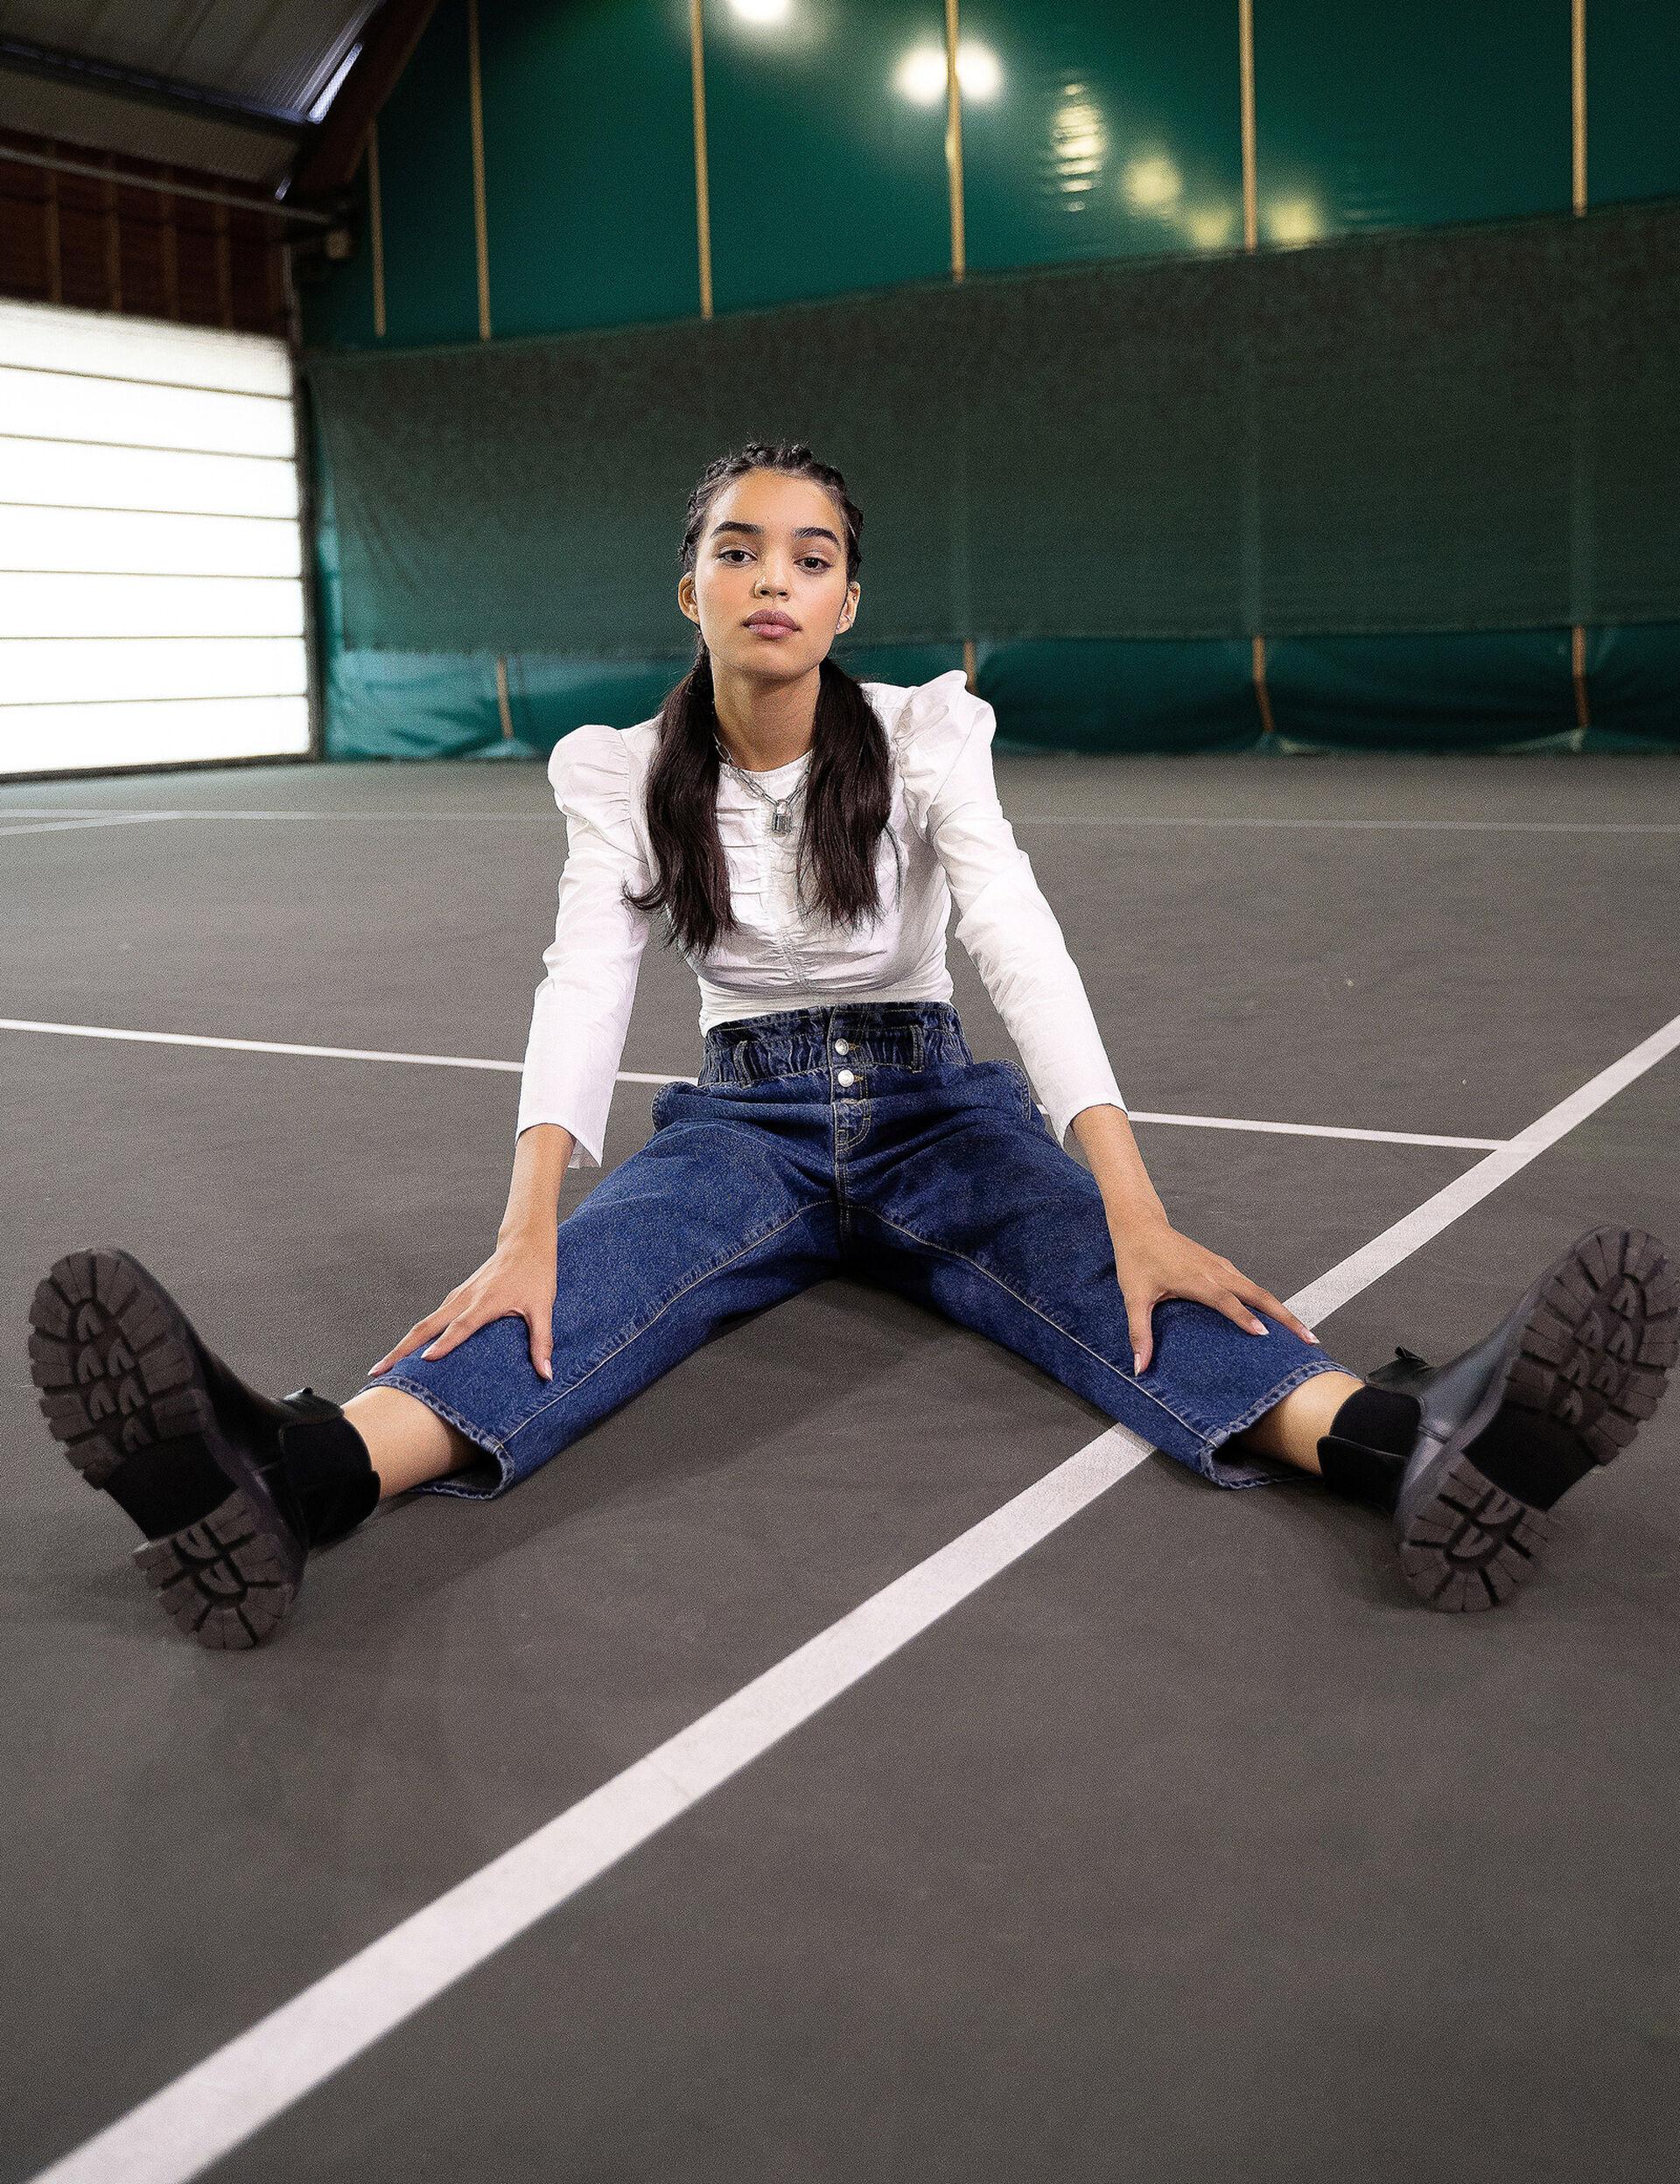 Elasticated high-waisted jeans